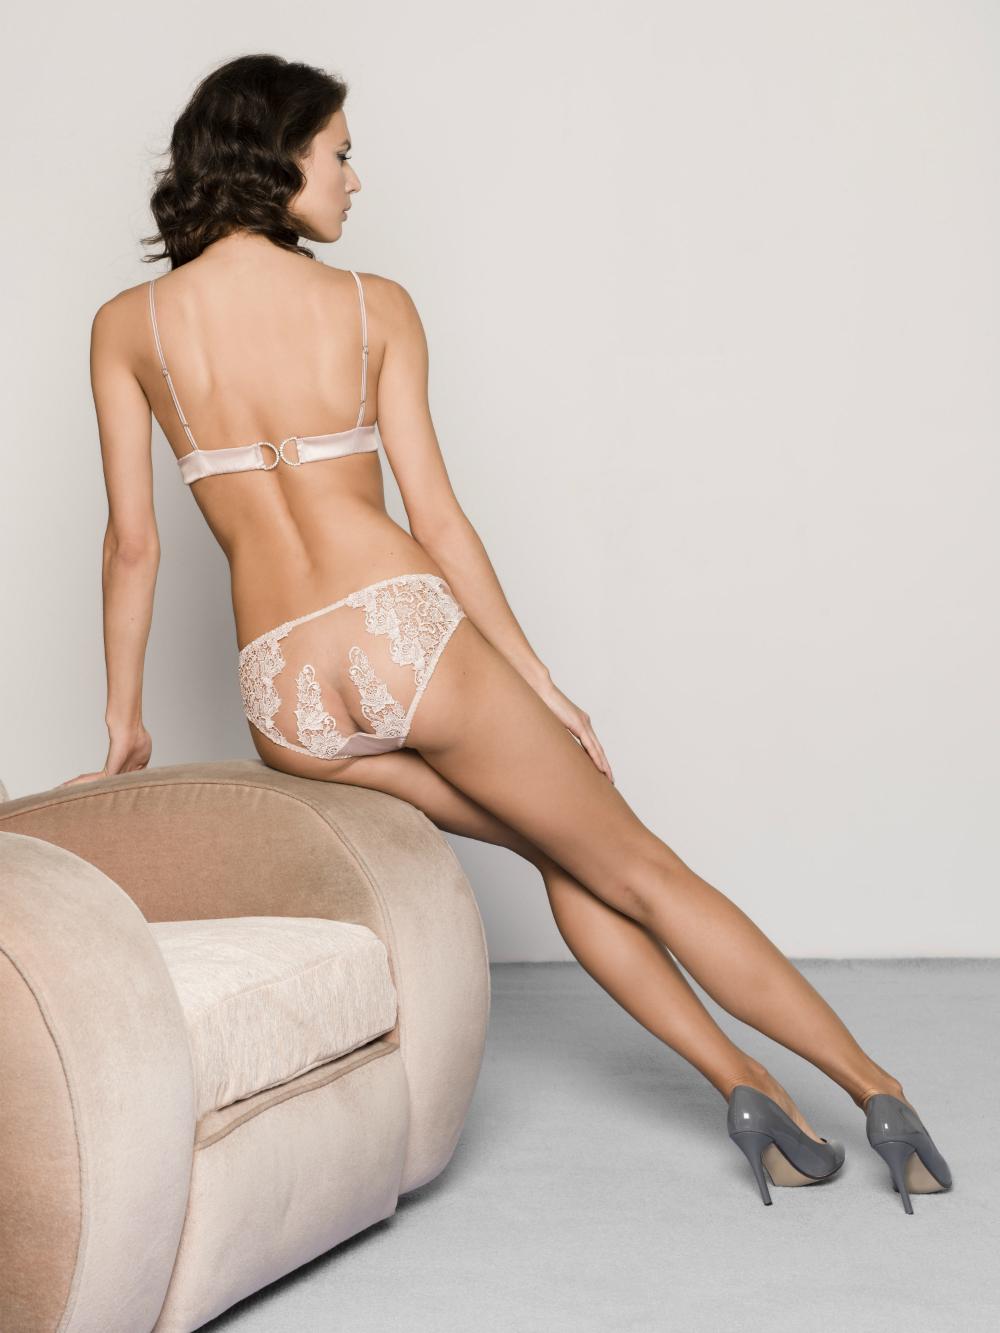 Fleur of England Blush boudoir bra and brief backshot_edit